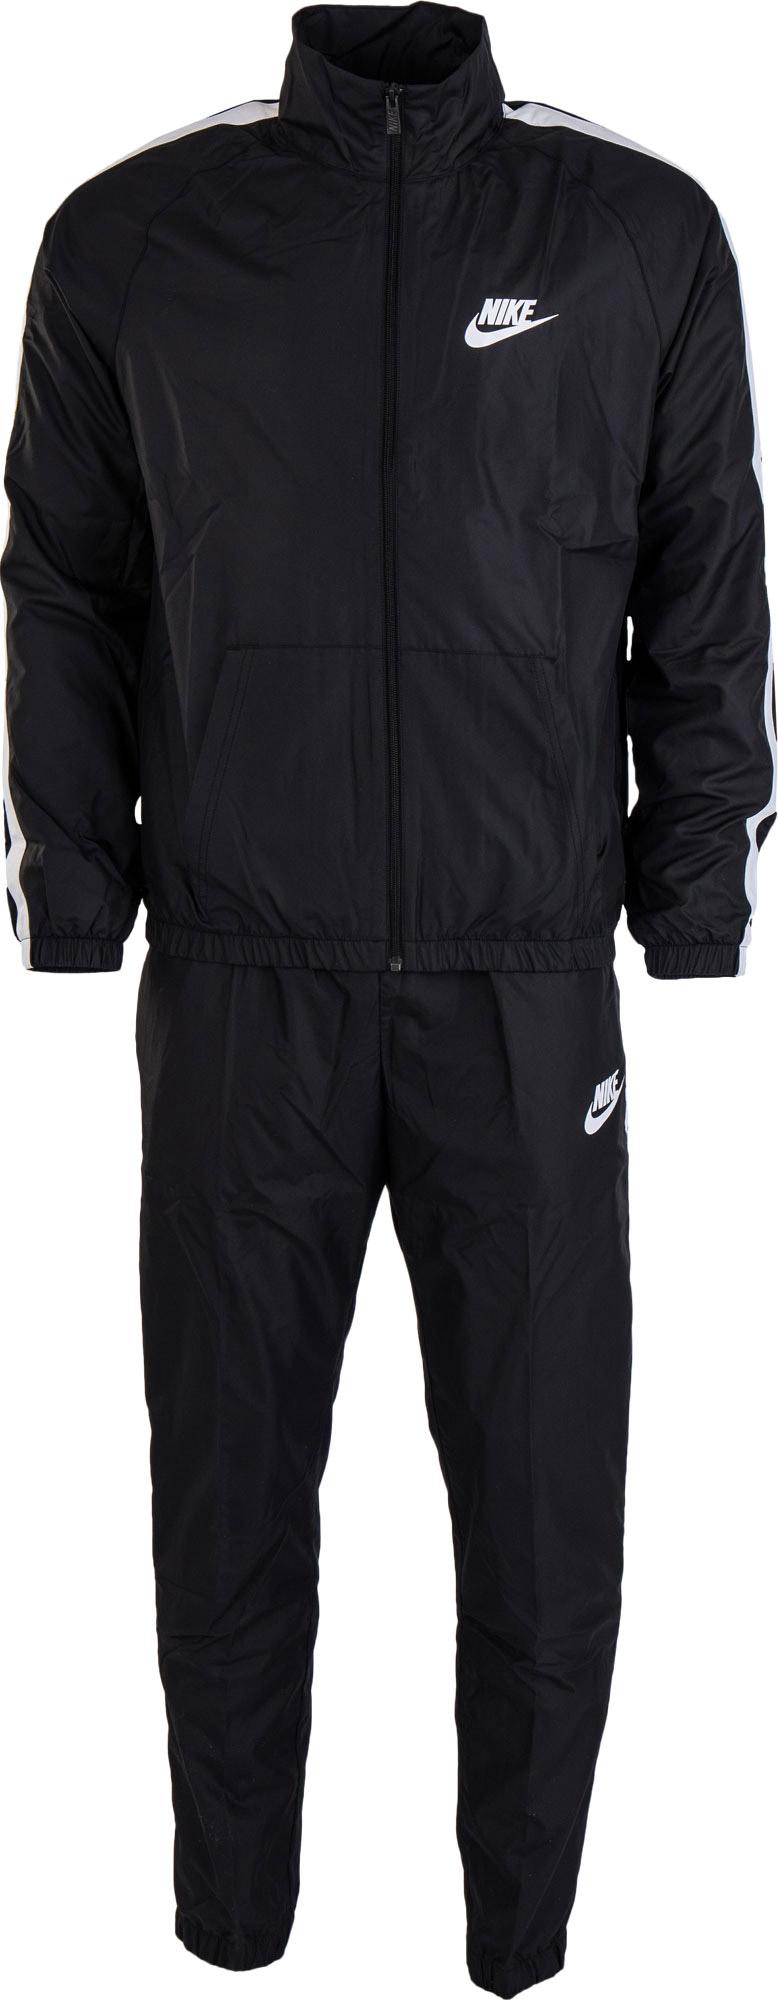 Nike M NSW TRK SUIT WVN SEASON | sportisimo.at